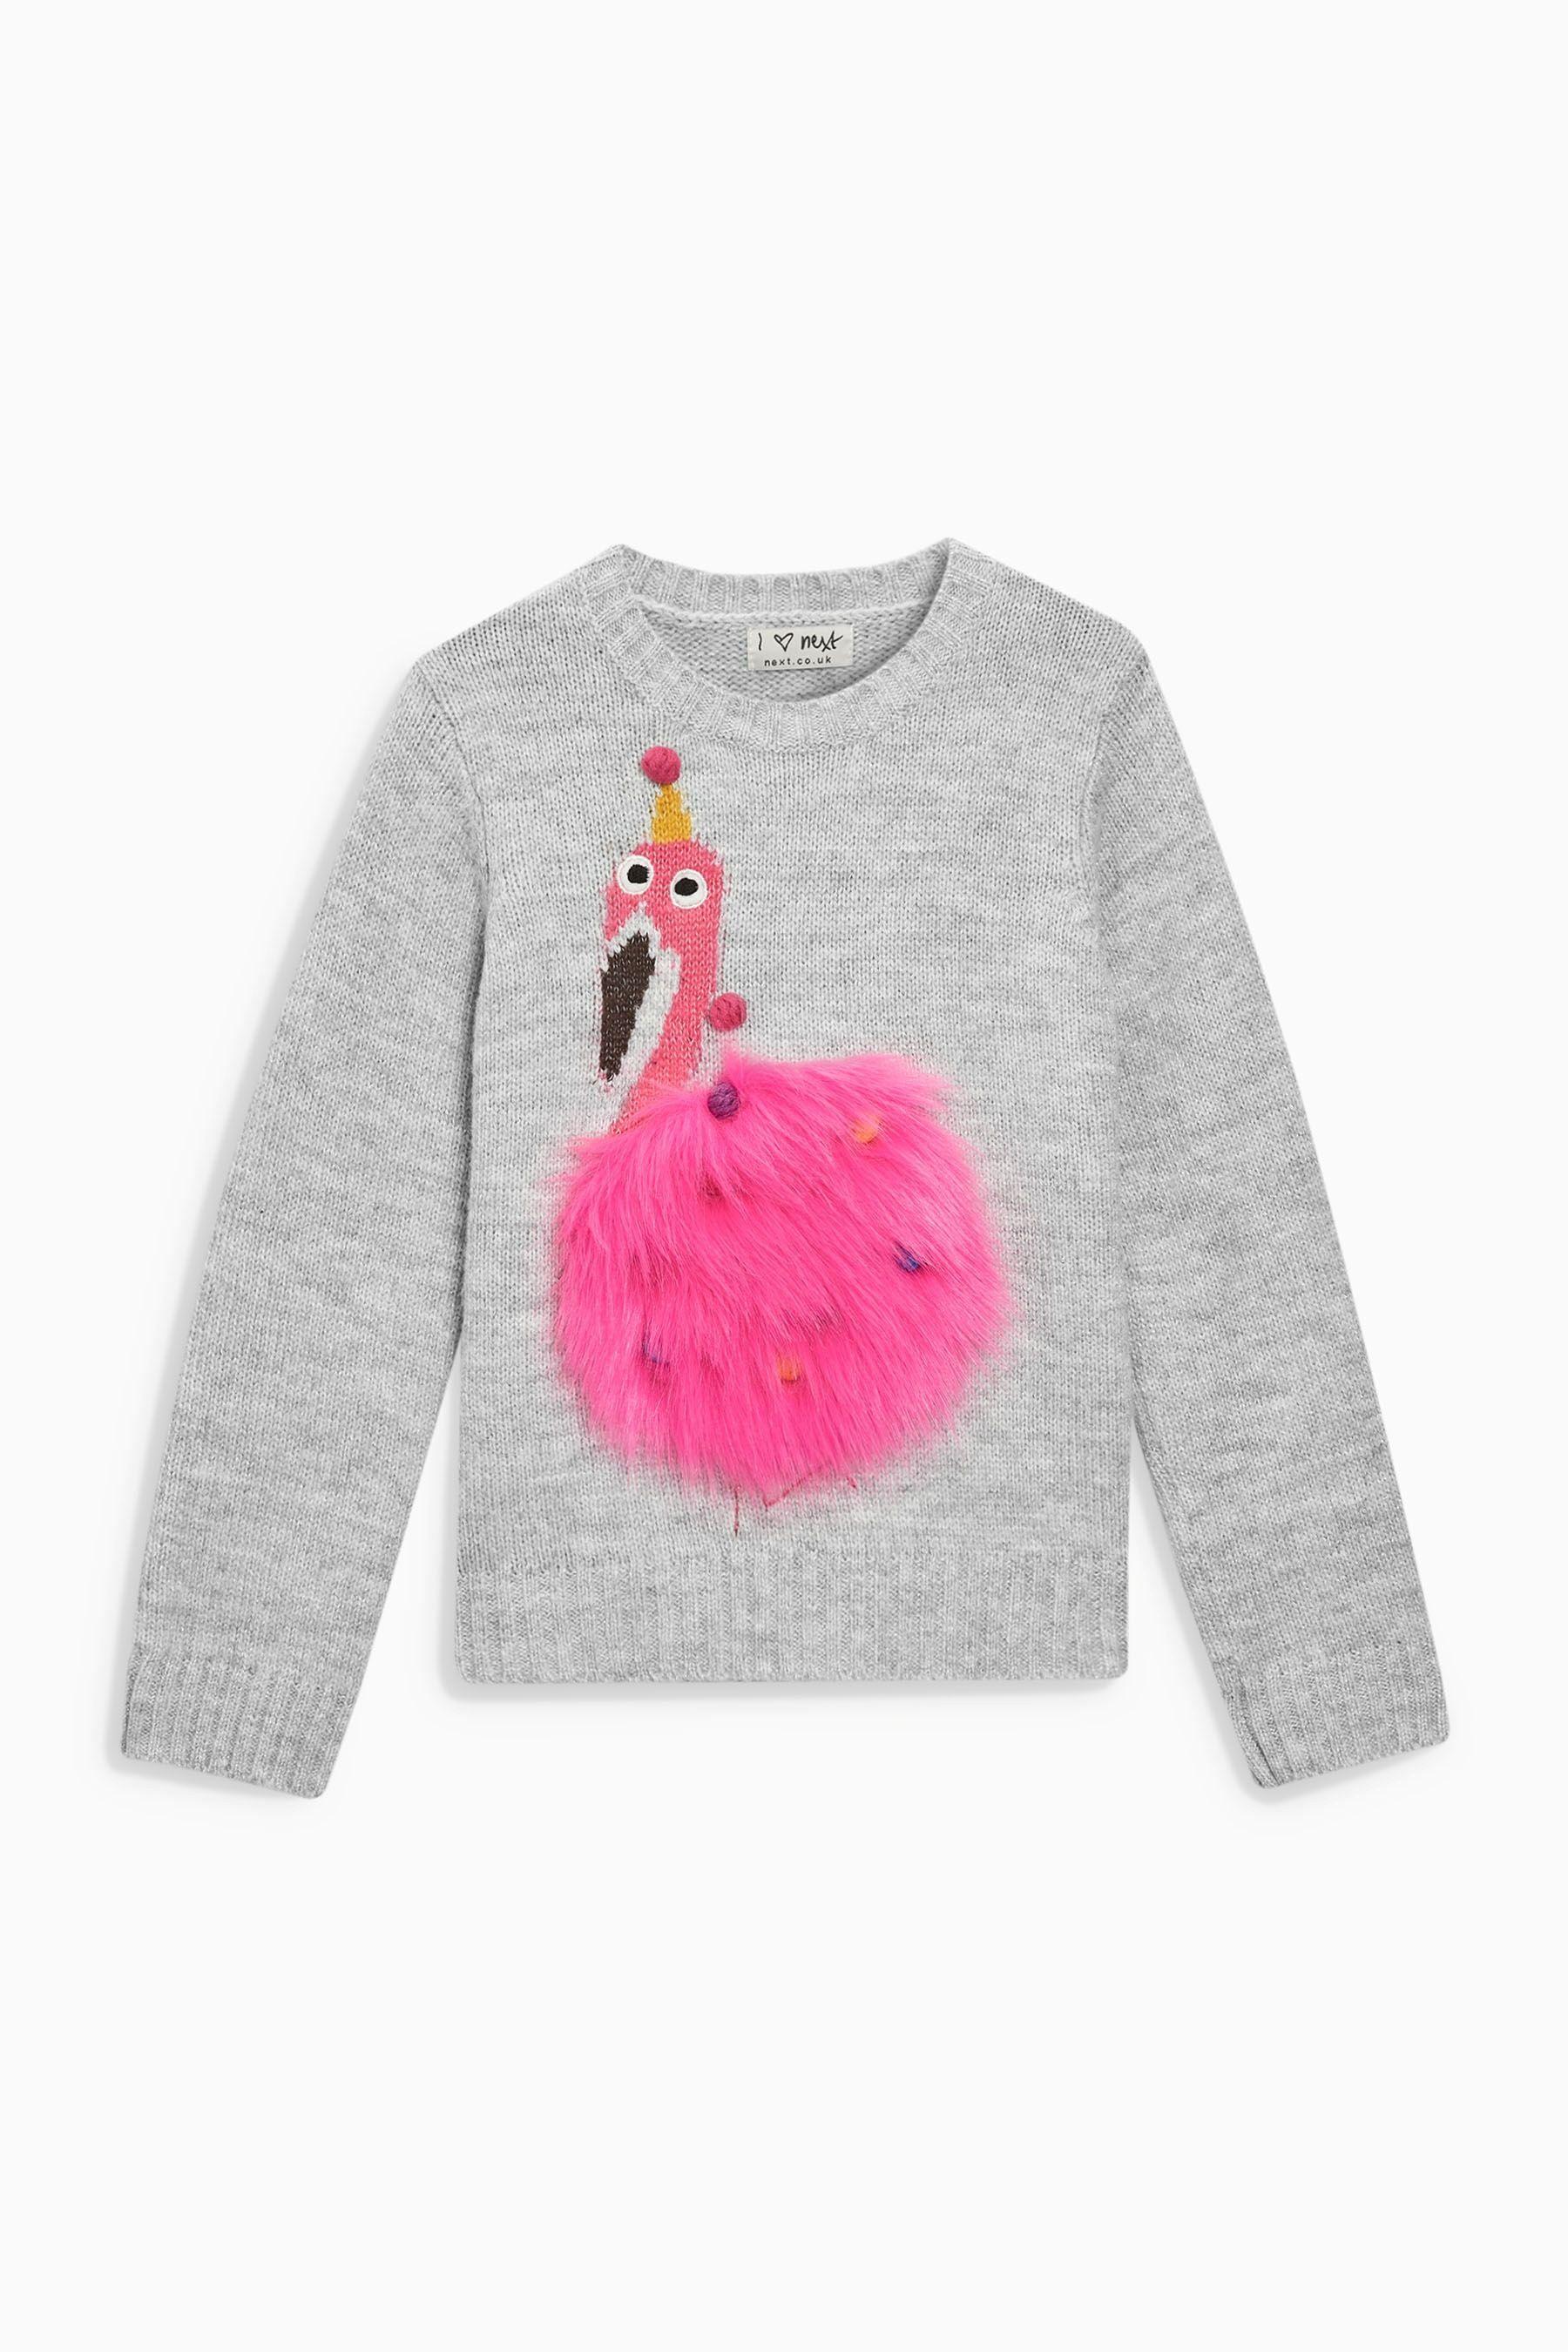 Acheter Pull duveteux gris à motif flamant rose (3-16 ans) from Next ... 0feec58a193